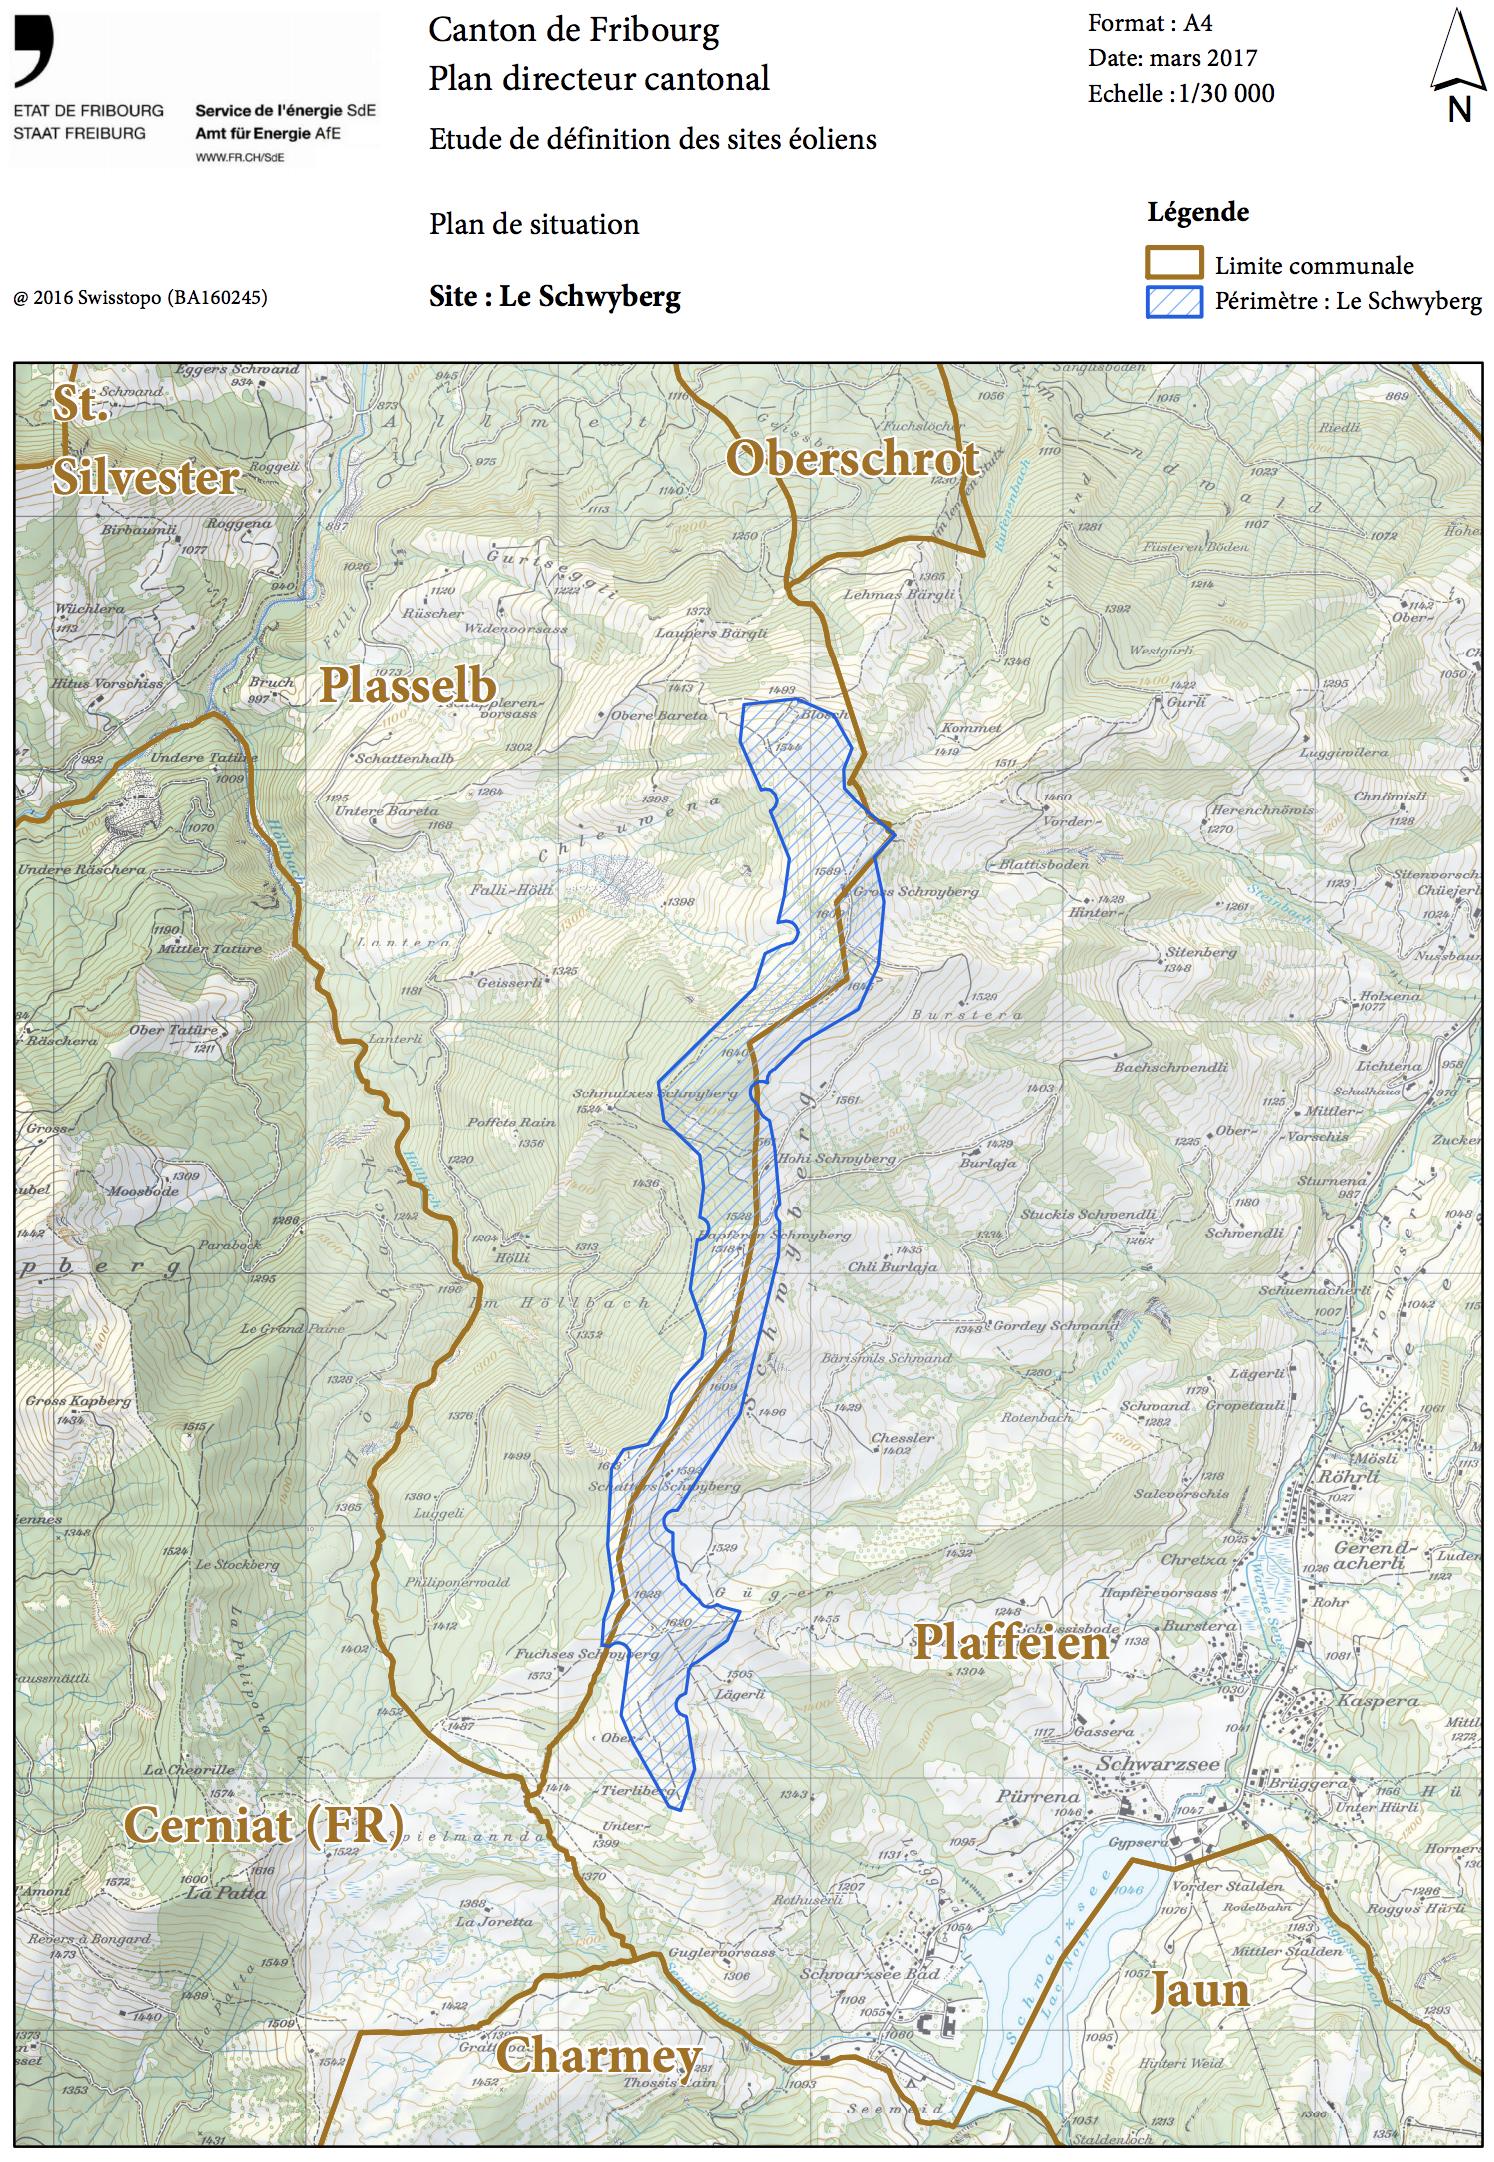 site_le-schwyberg